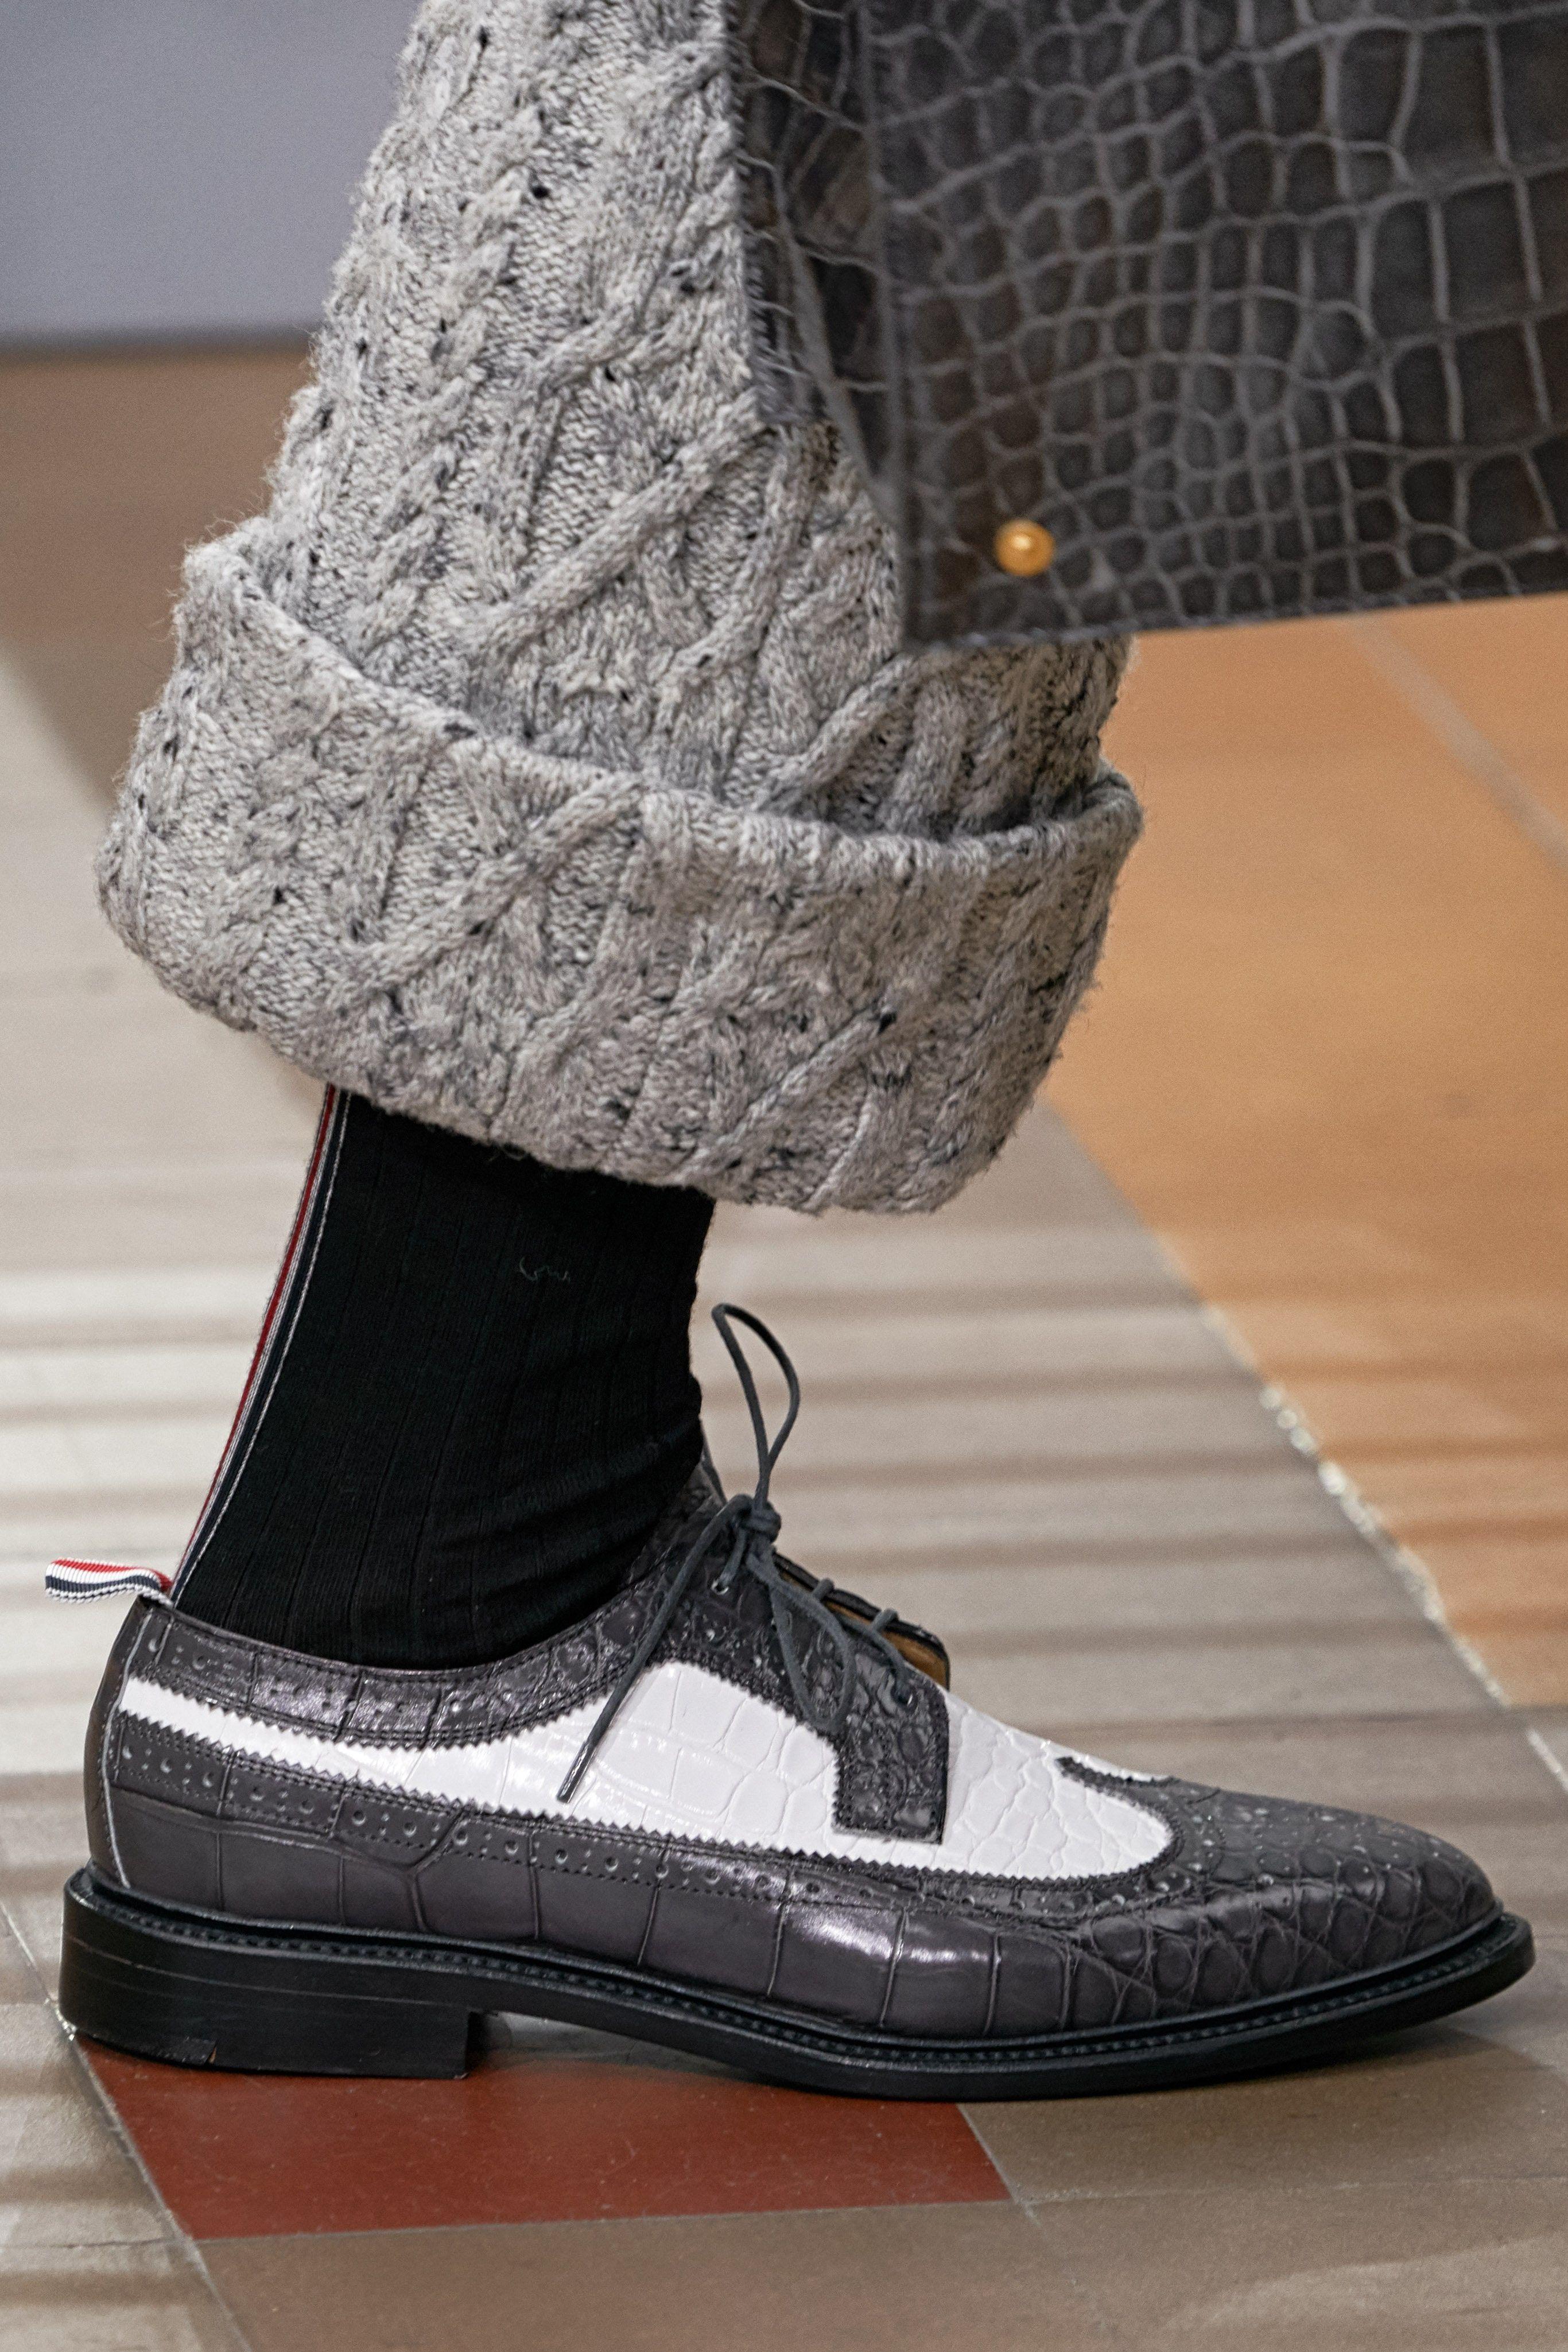 Thom Browne Fall 2019 Ready-to-Wear